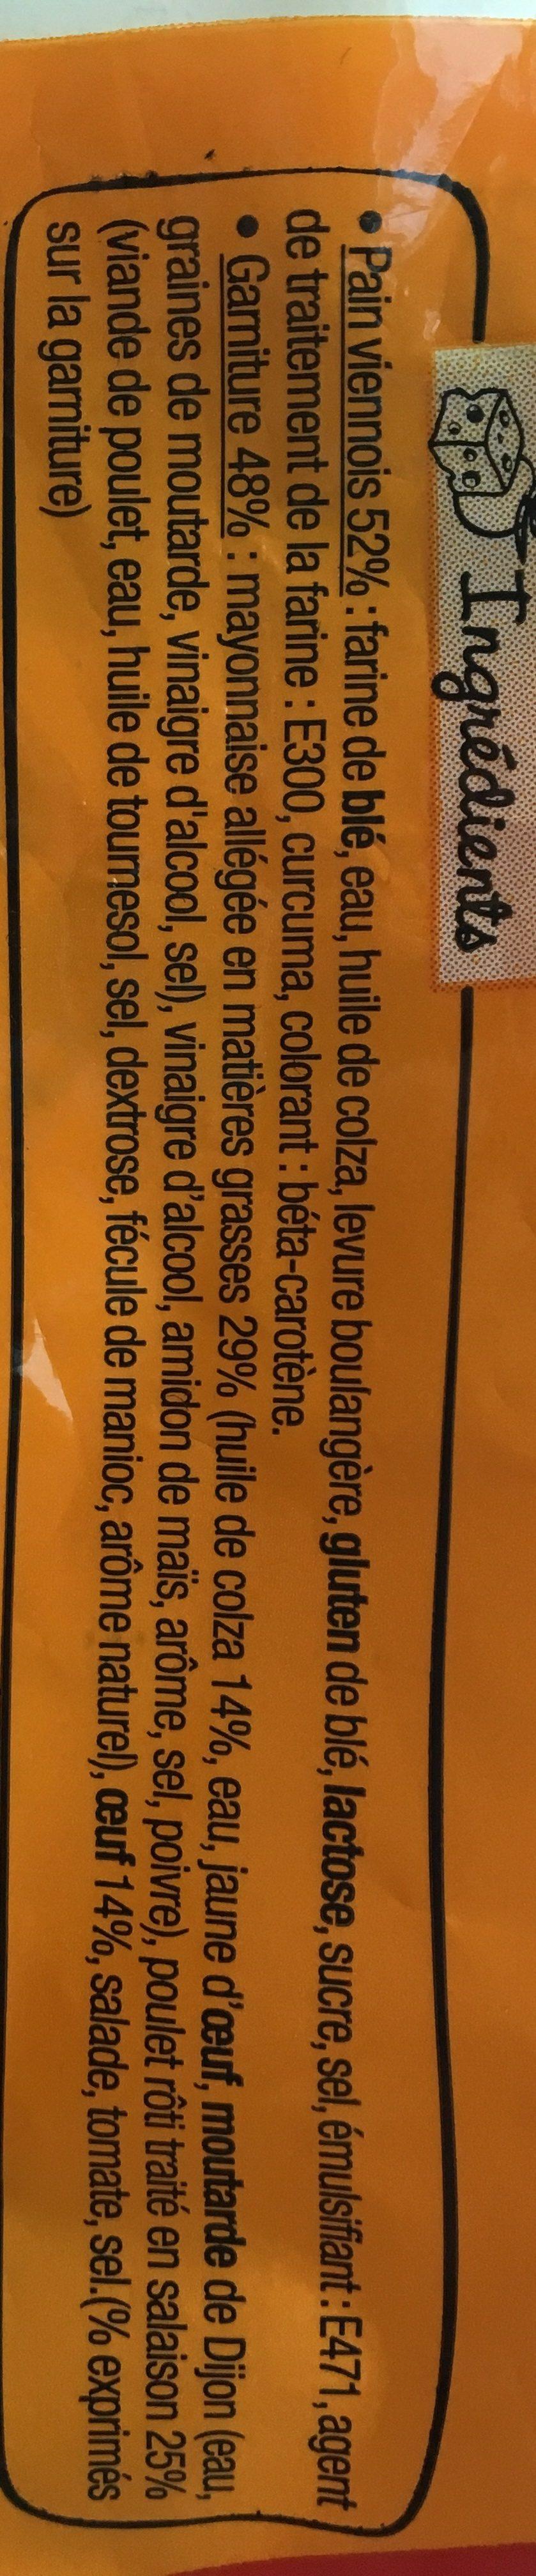 Poulet rôti Oeuf Mayo légère - Sodebo - 270 g